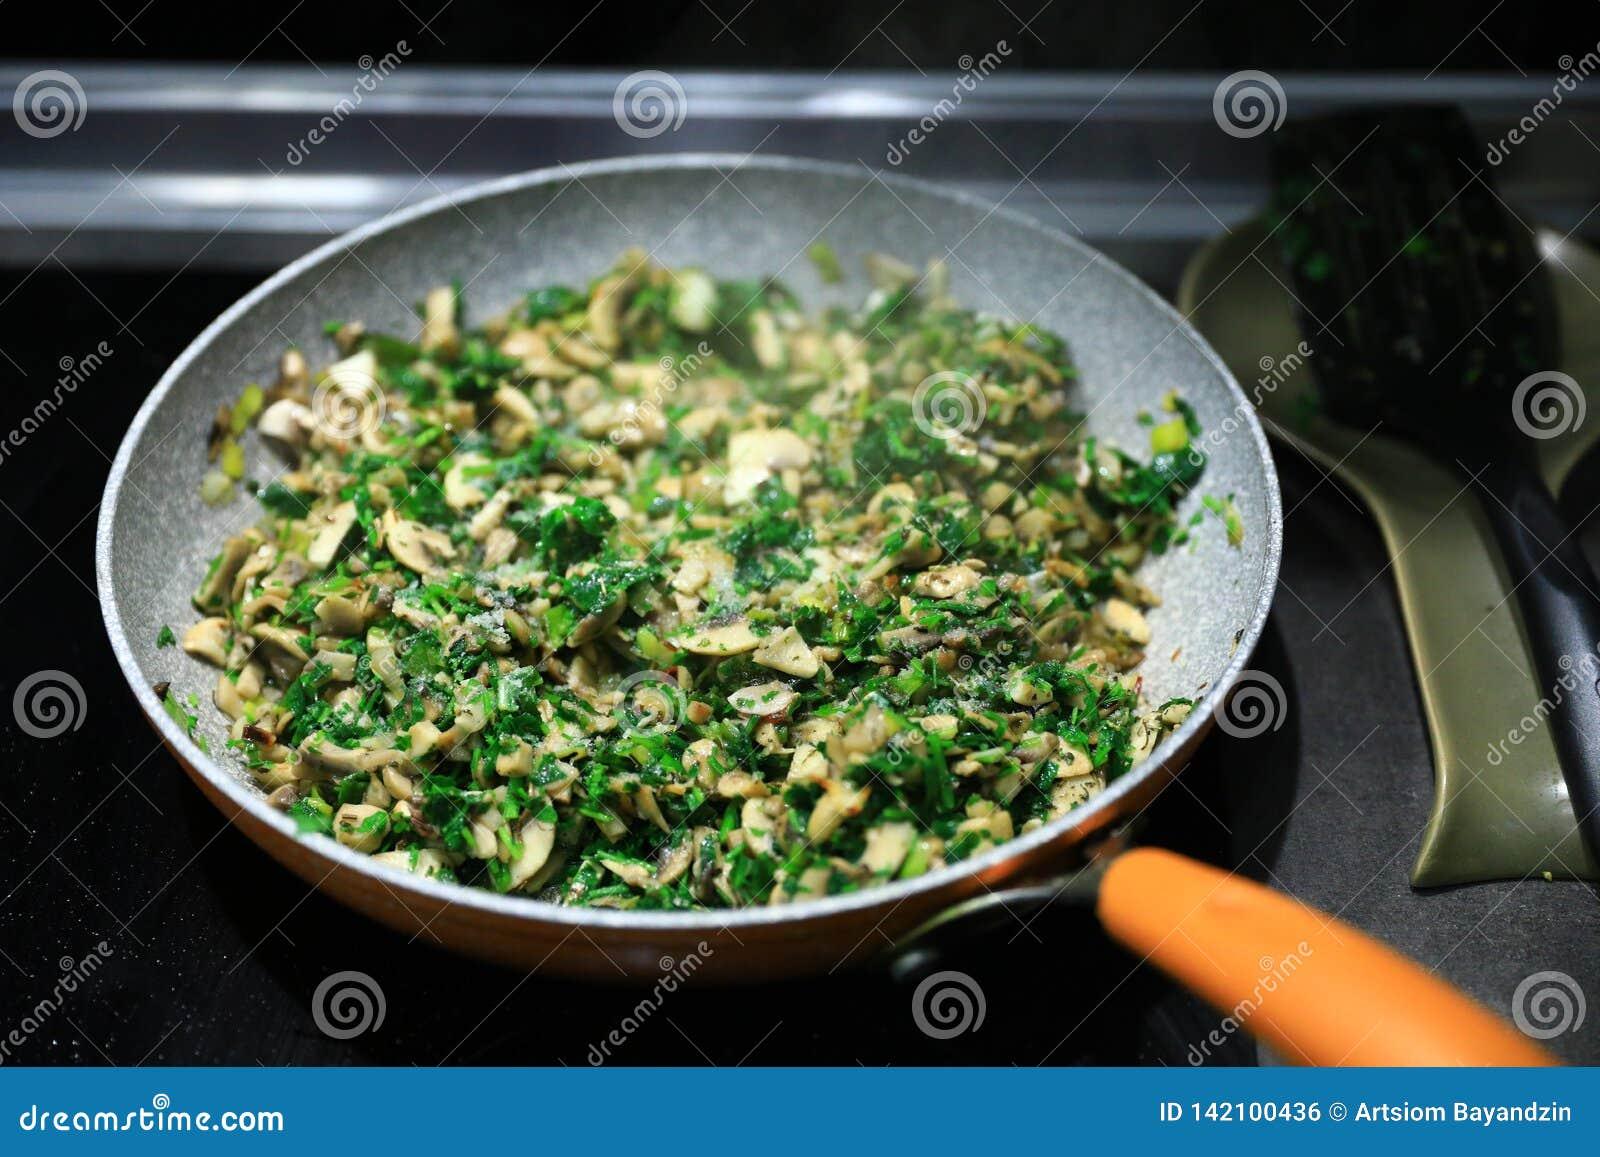 Pan-fried mushrooms with greens